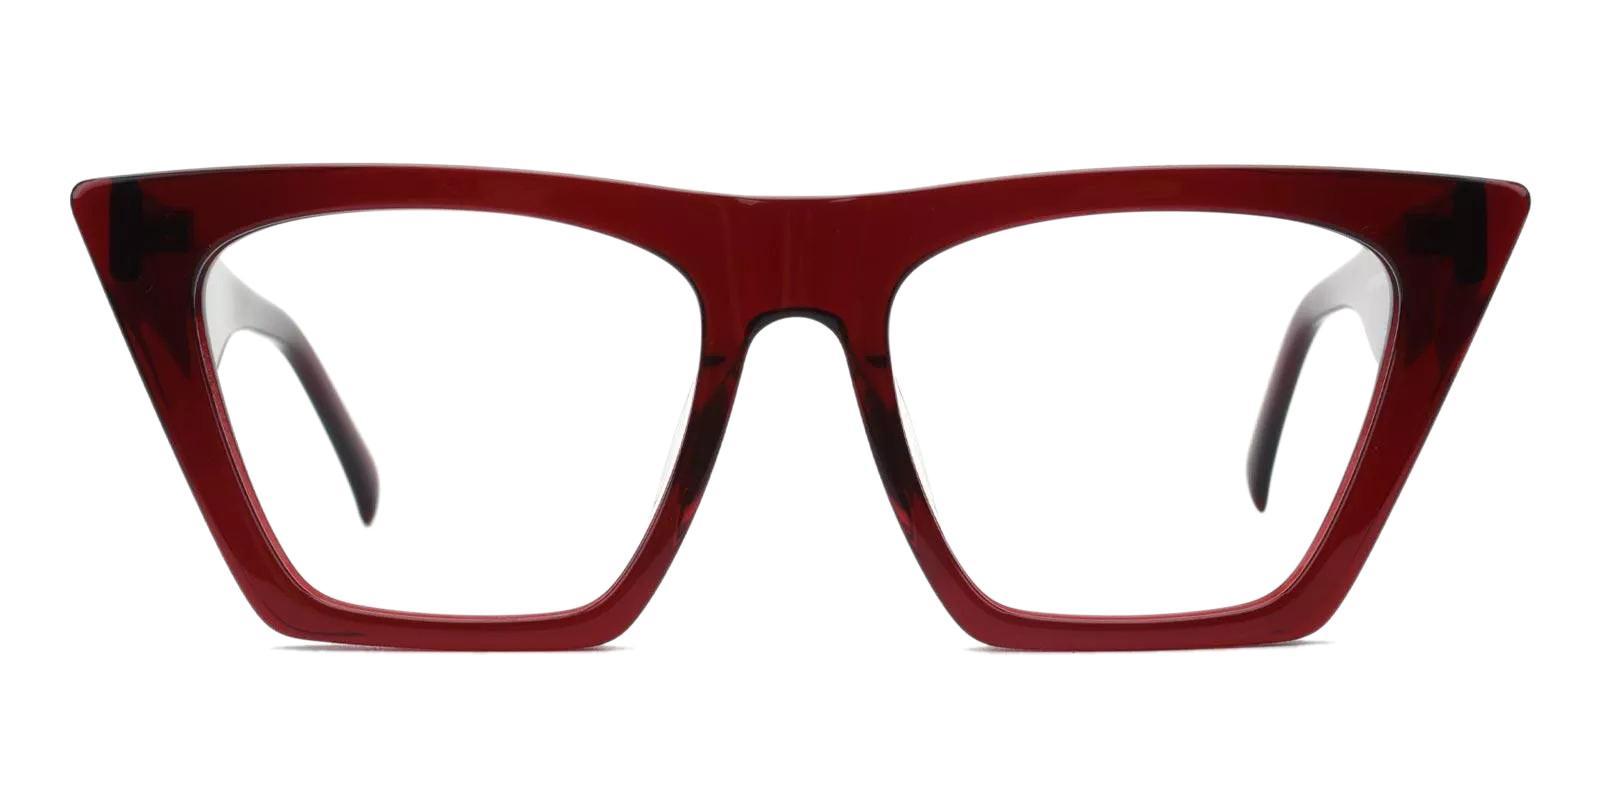 Haley Red Acetate Eyeglasses , Fashion , UniversalBridgeFit Frames from ABBE Glasses